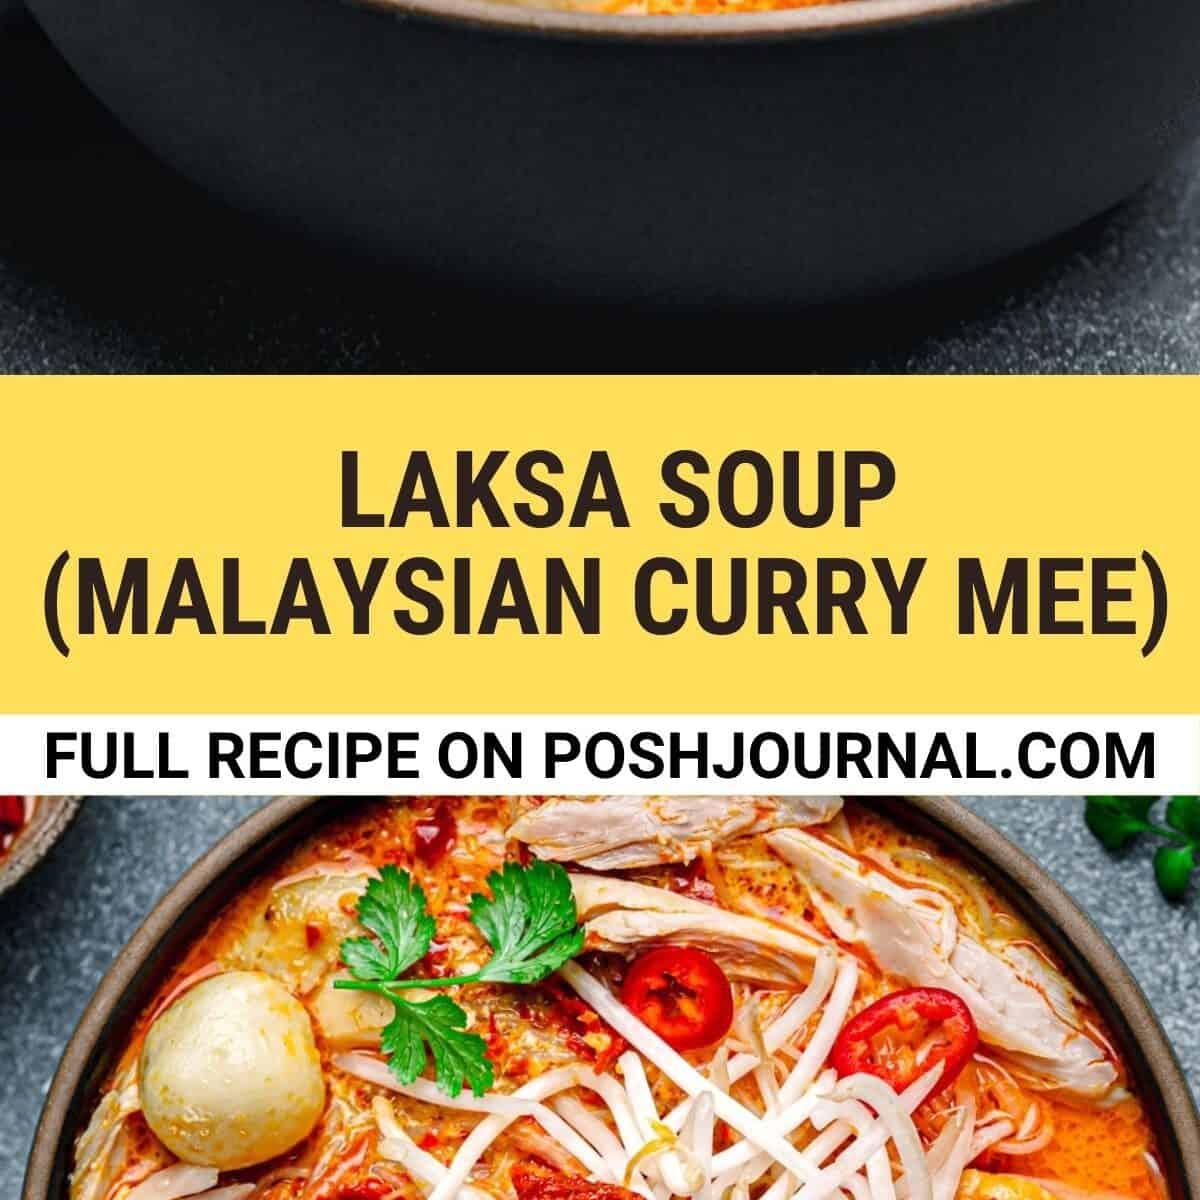 Laksa Soup Recipe pin.